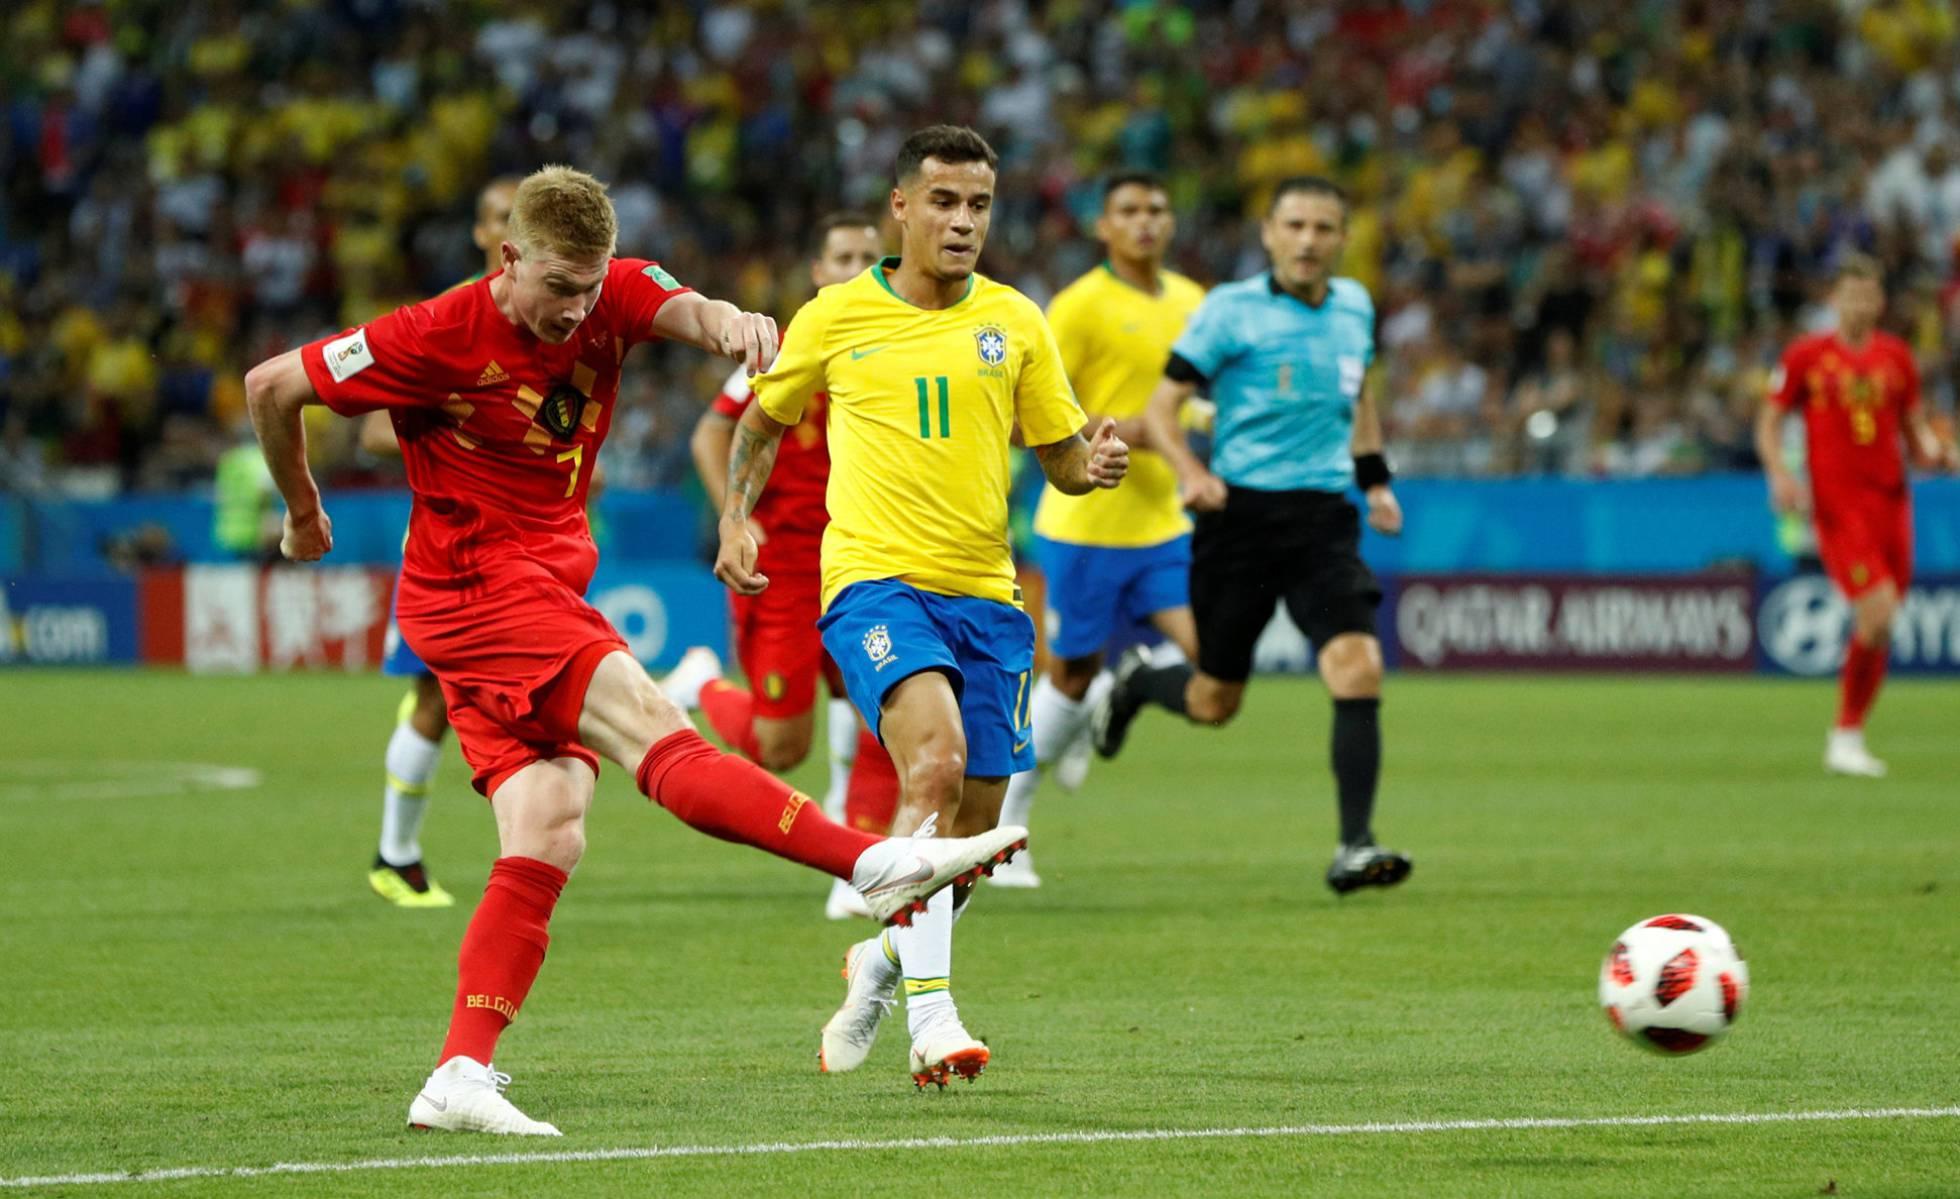 De Bruyne dispara en el segundo gol. JOHN SIBLEY REUTERS